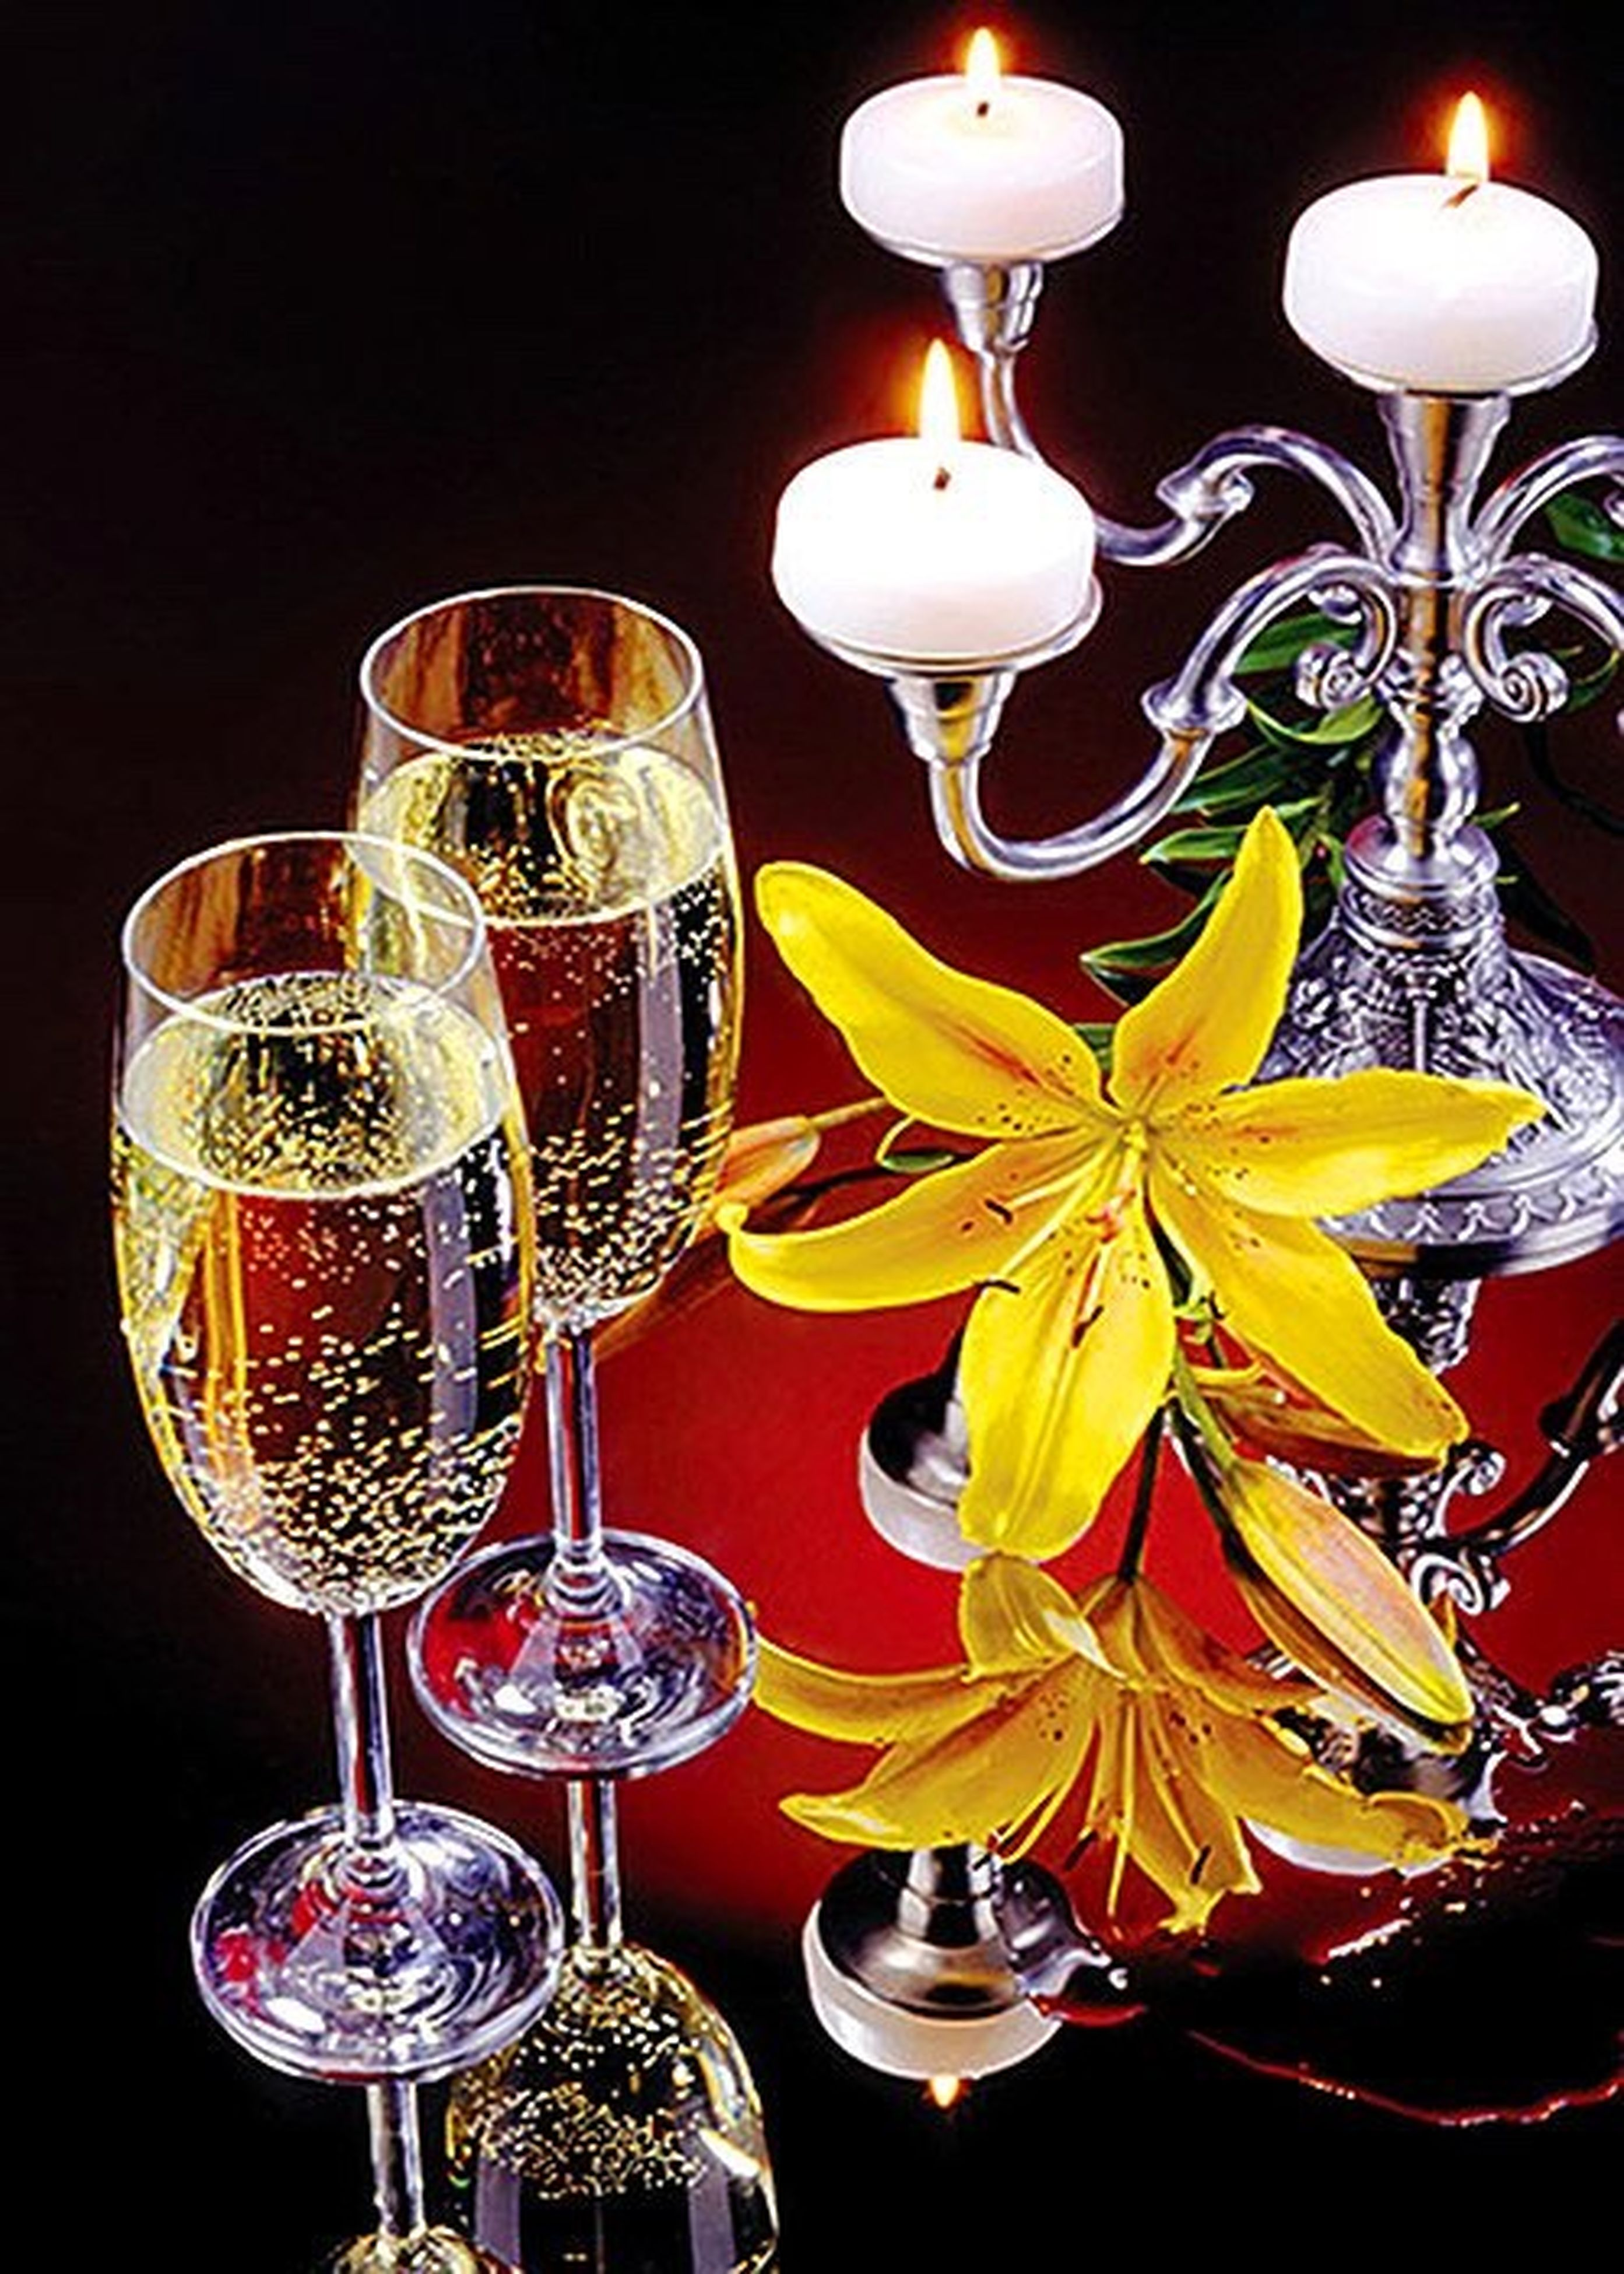 night, drink, lighting equipment, bar - drink establishment, celebration, champagne flute, cocktail, alcohol, illuminated, no people, martini, nightlife, indoors